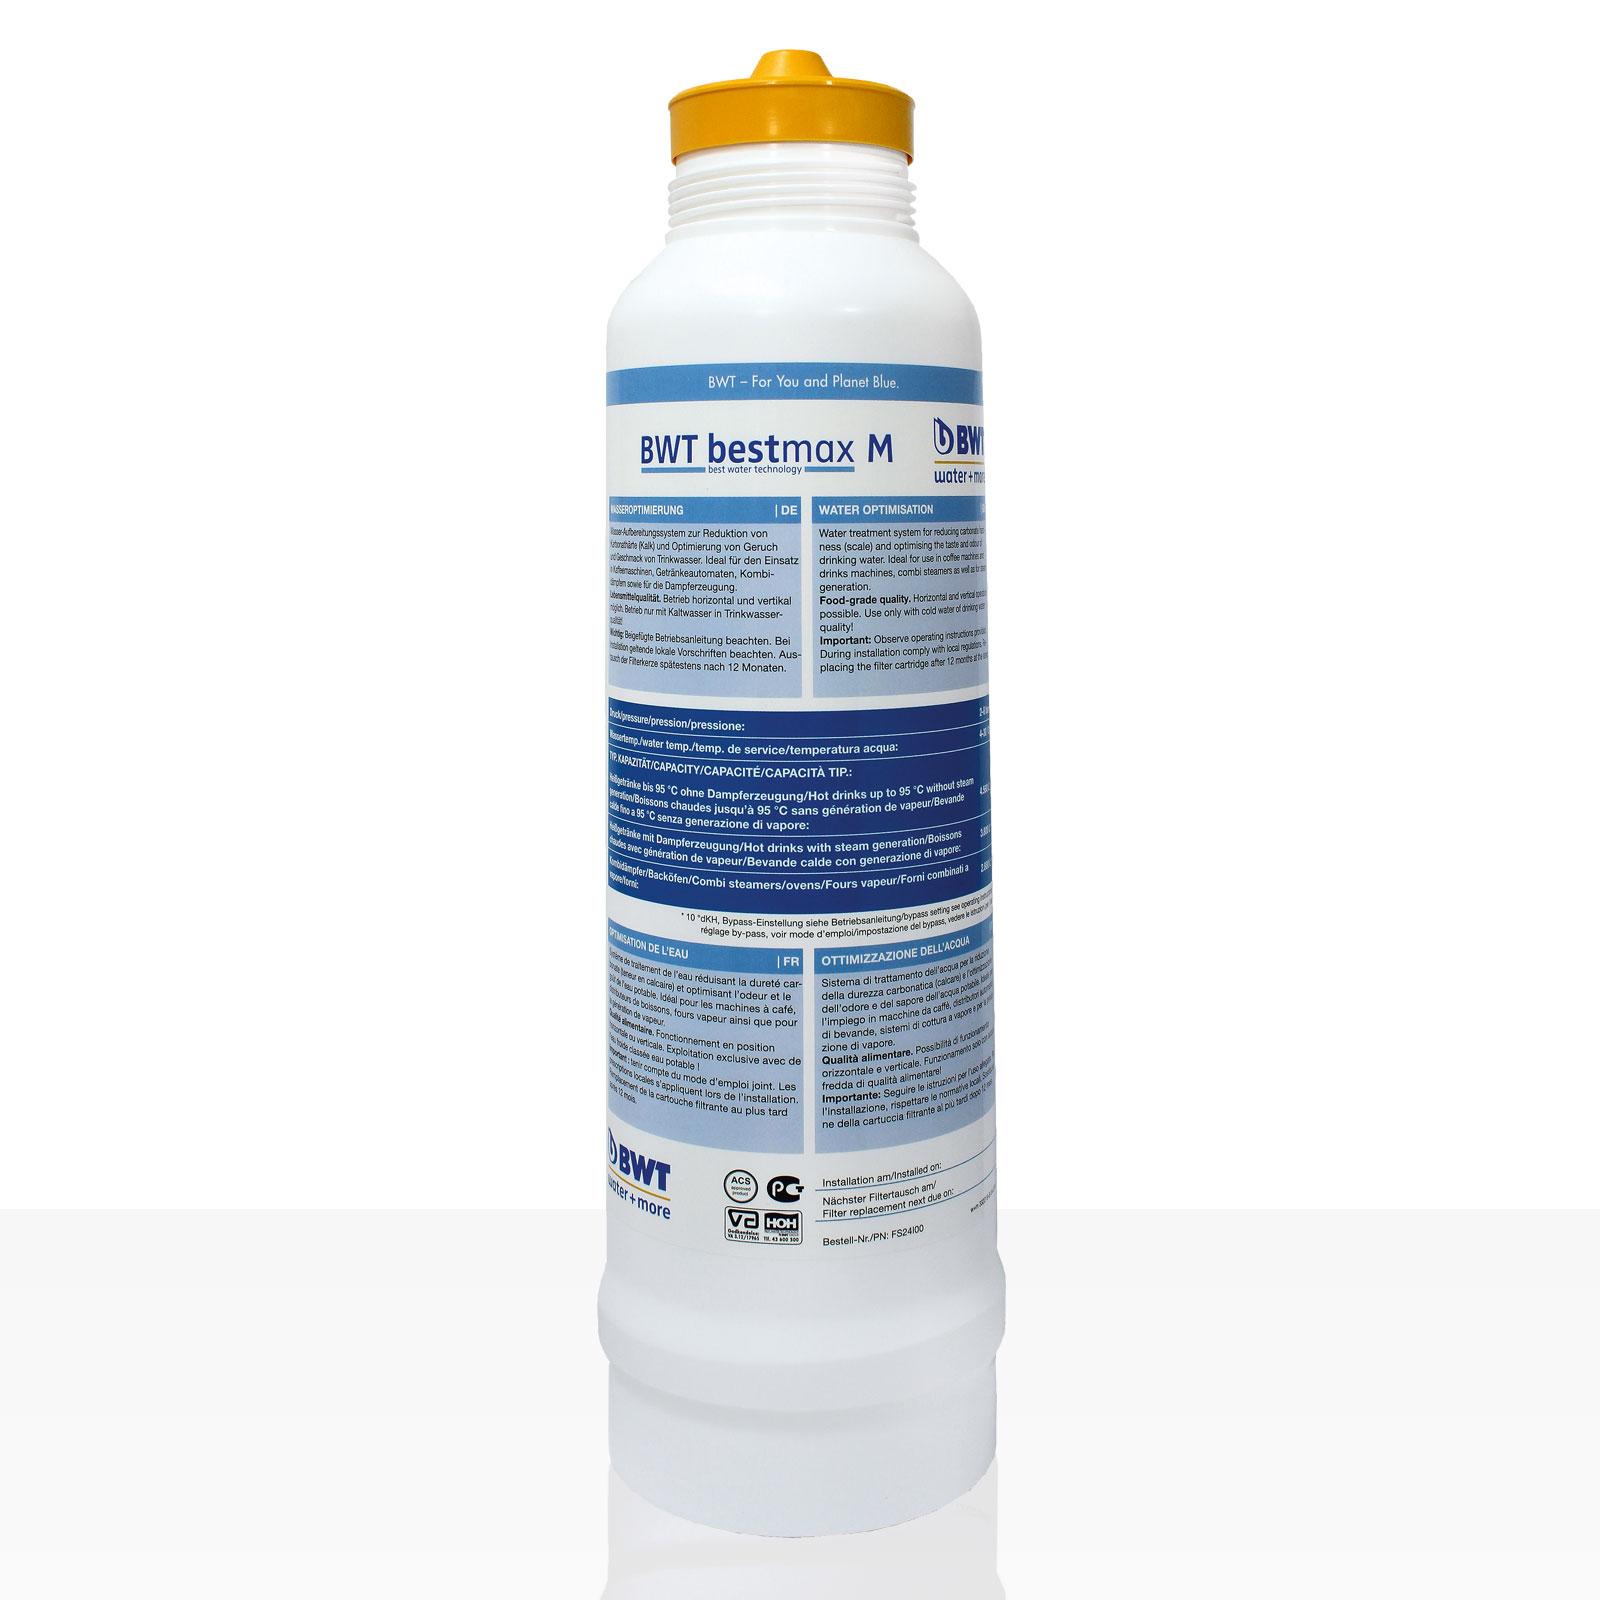 Sale - Bestmax M Filterkerze, BWT water + more Wasserfilter ca. 3800 L - B-Ware